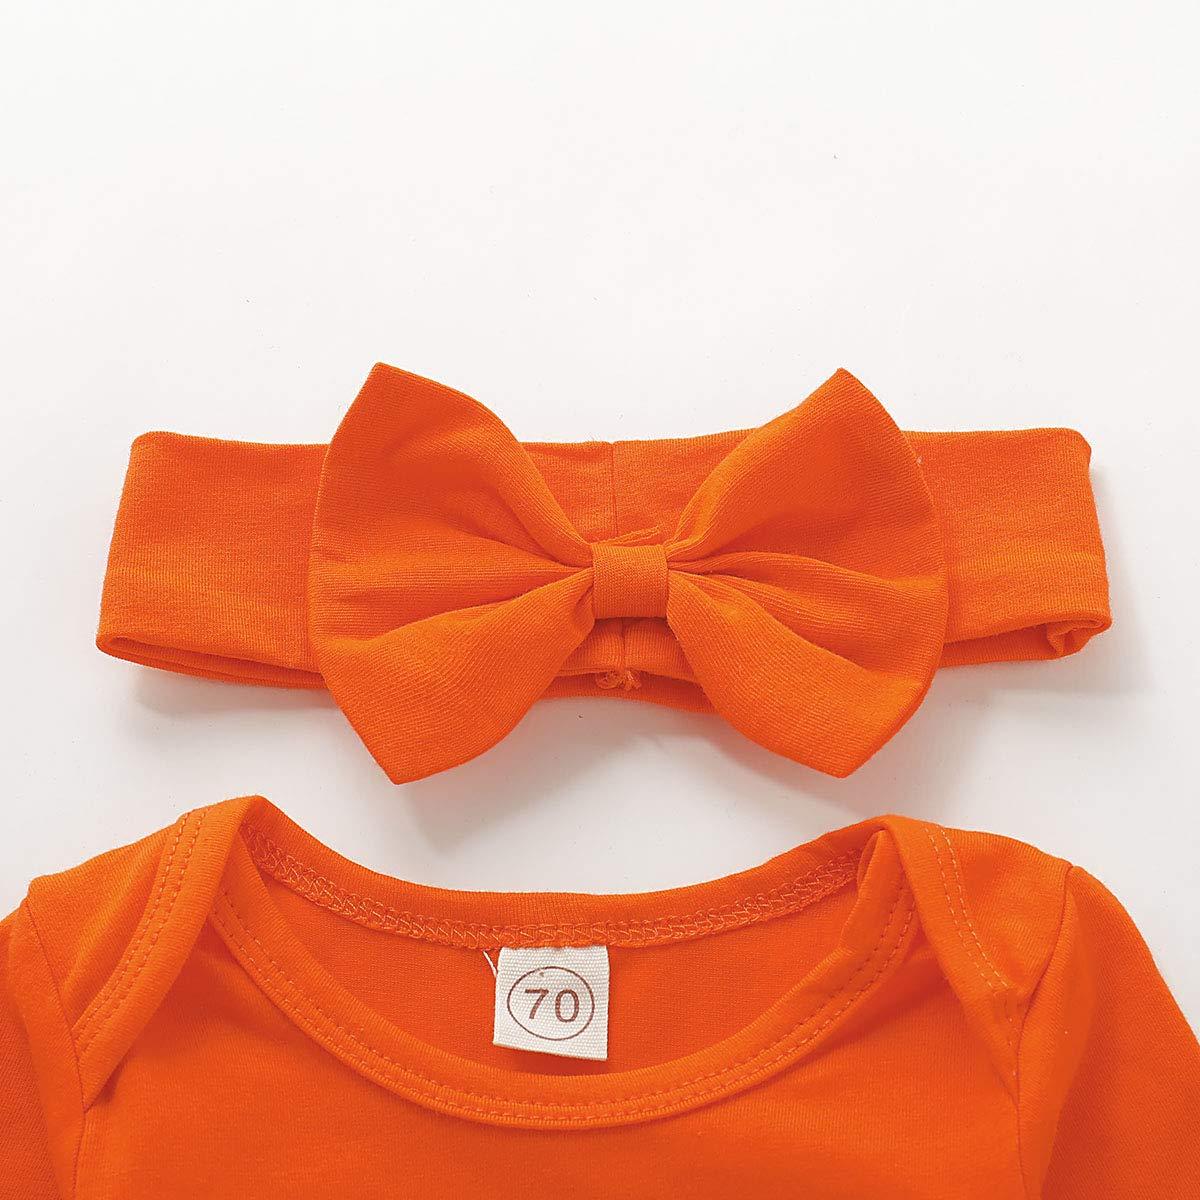 Dacestar 3PC Newborn Baby Girls Clothes My First Halloween Print Pumpkin Romper Outfits Set with Headband and Leg Warmer Sets